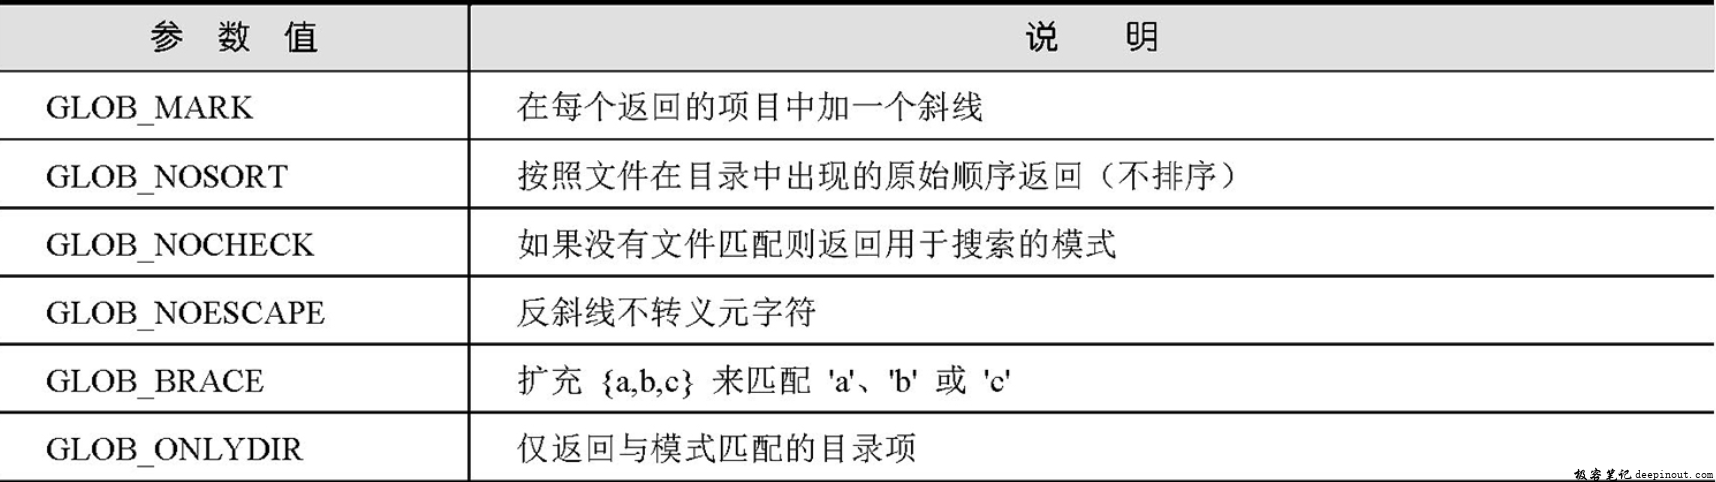 glob()函数的flags参数说明